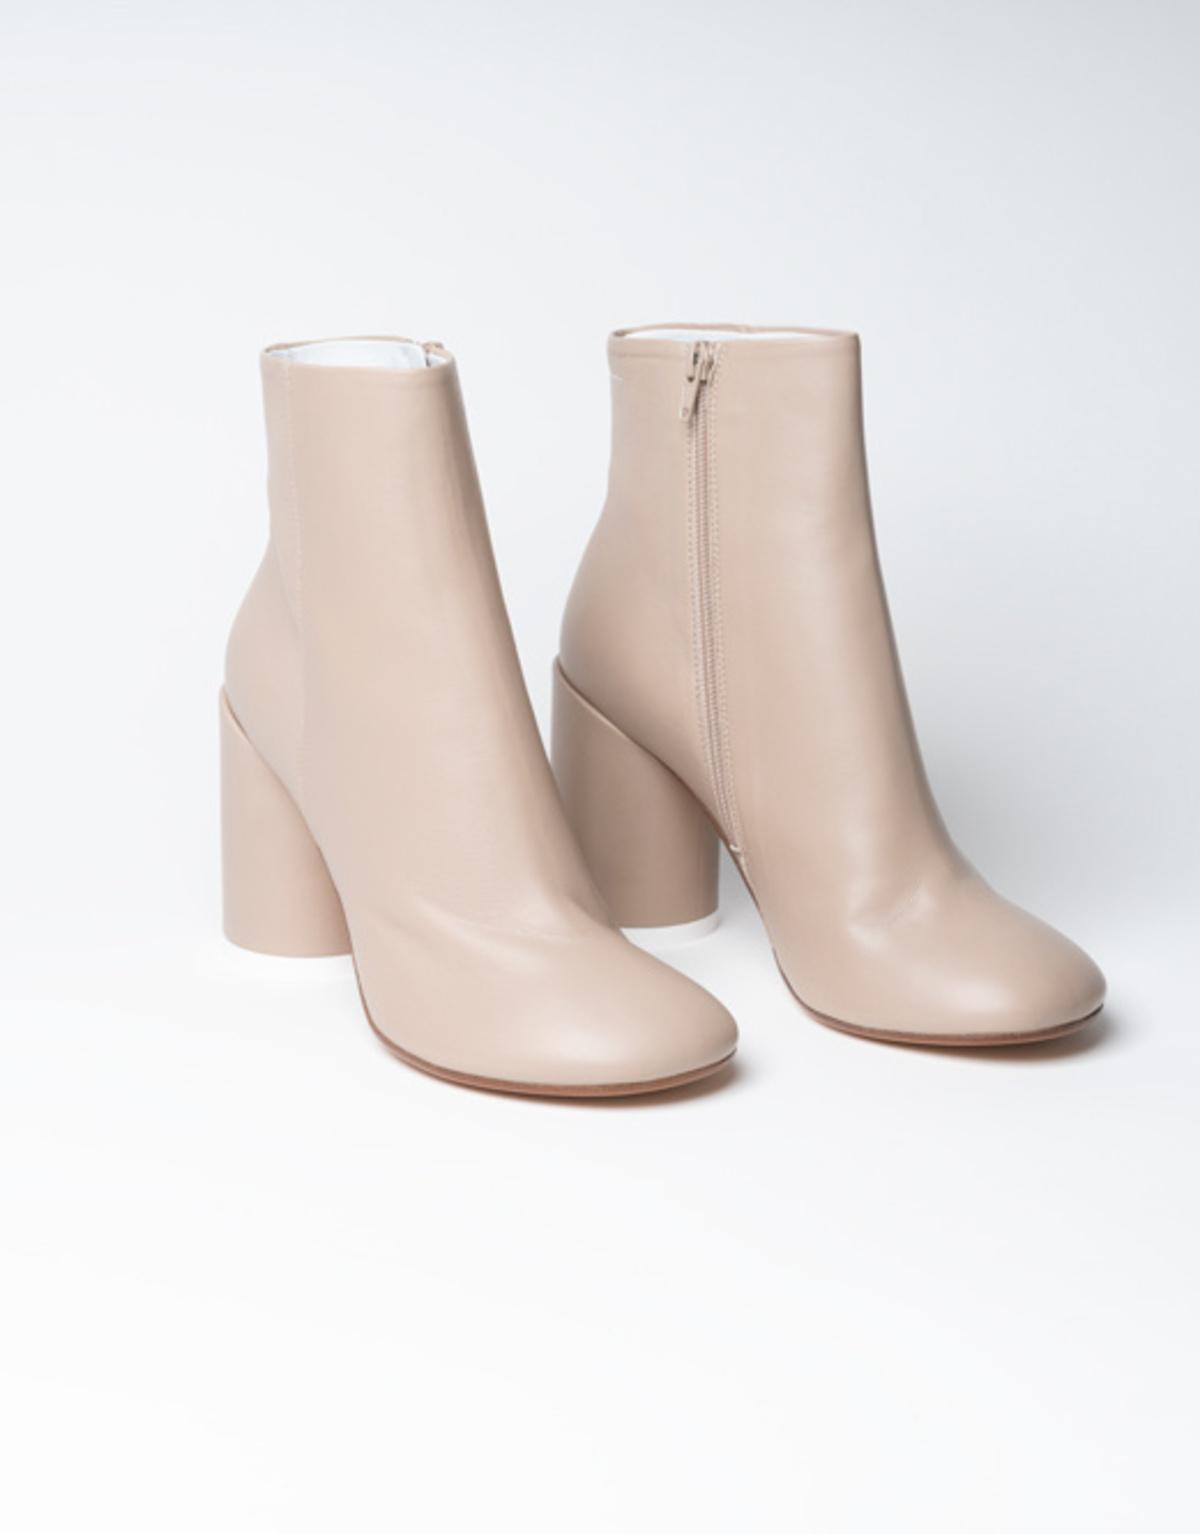 Mm6 Maison Margiela 6 Heel Leather